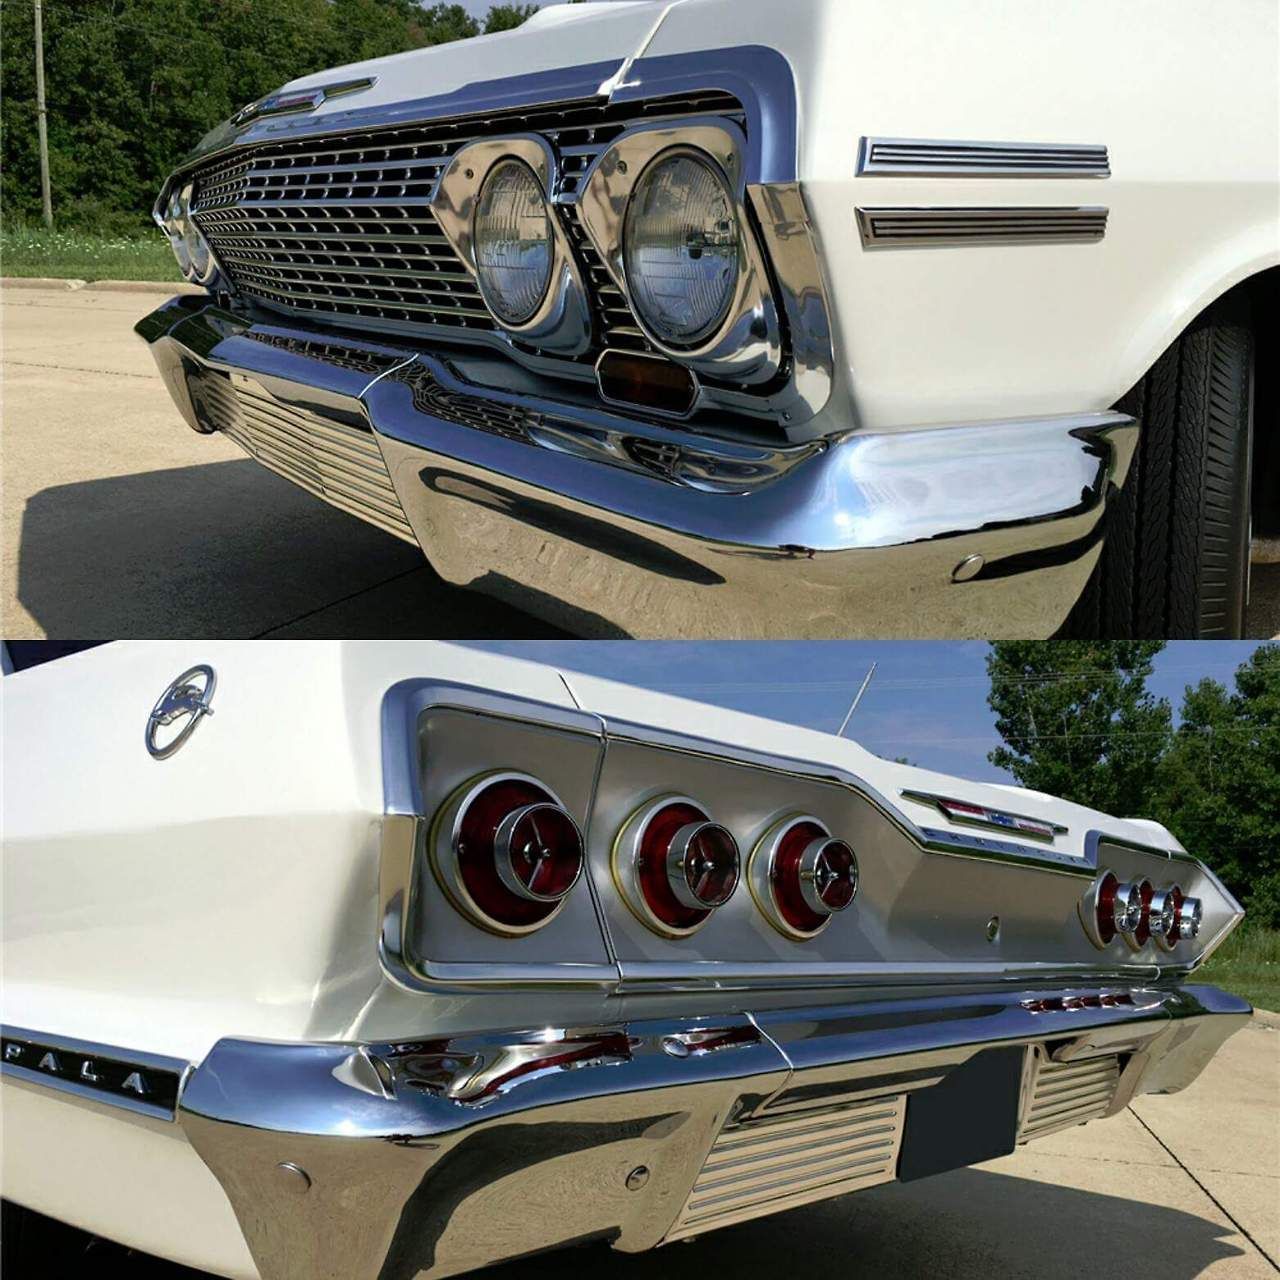 Cars and more chevy impala chevy impalas vehicles drag racing racing - Chevrolet Impala Ss